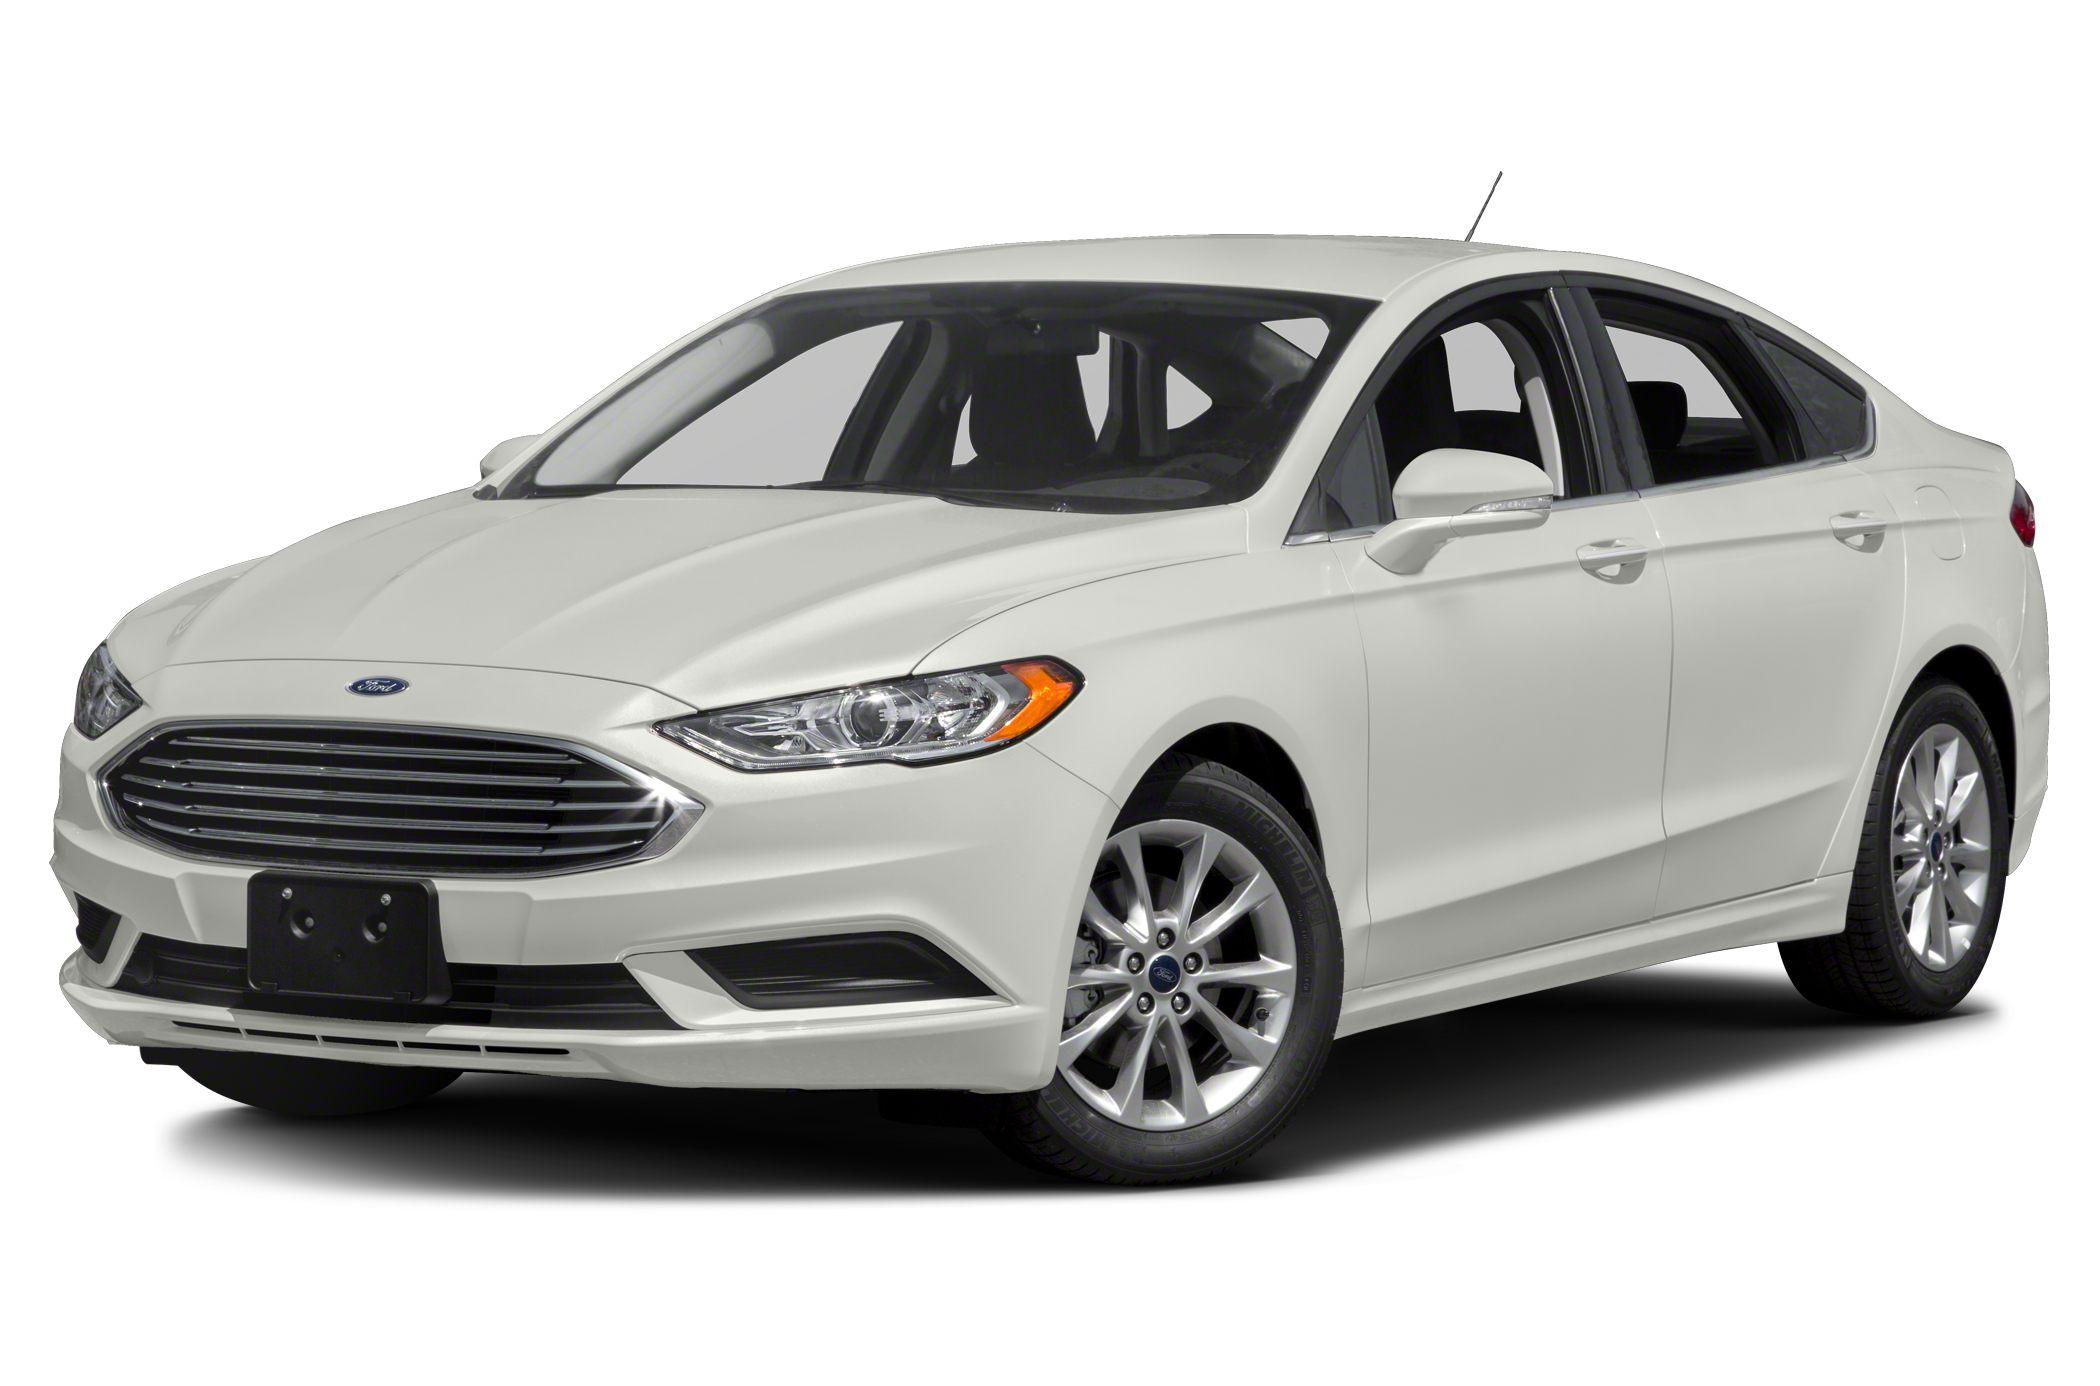 2018 Ford Fusion SE Miles 0Color White Platinum Stock F8460 VIN 3FA6P0H96JR187387